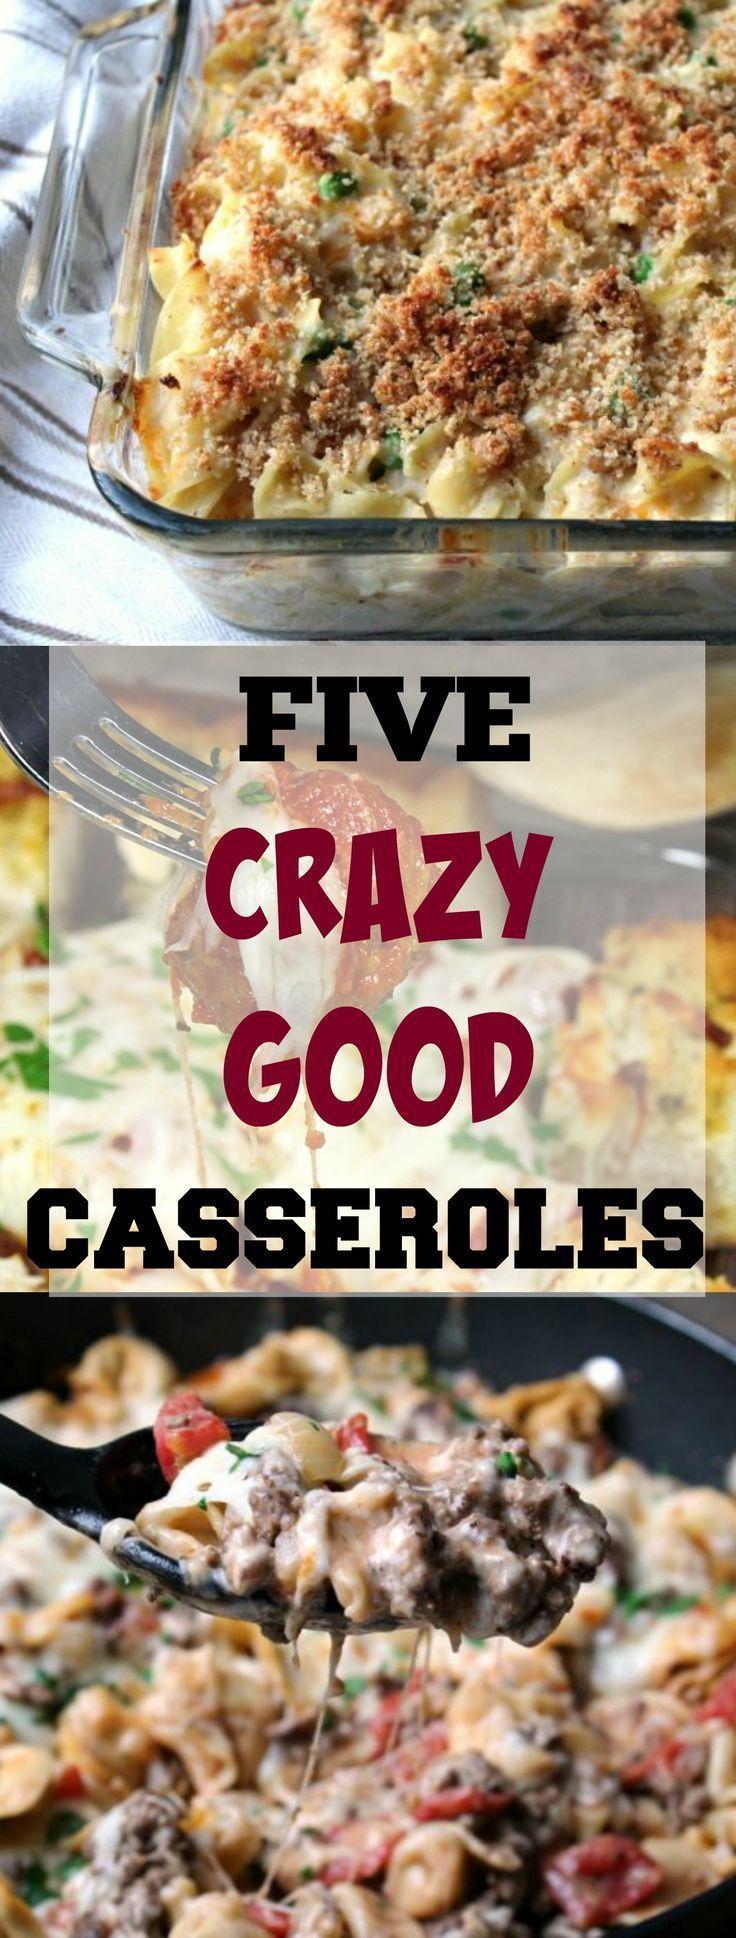 5 Crazy Good Casseroles